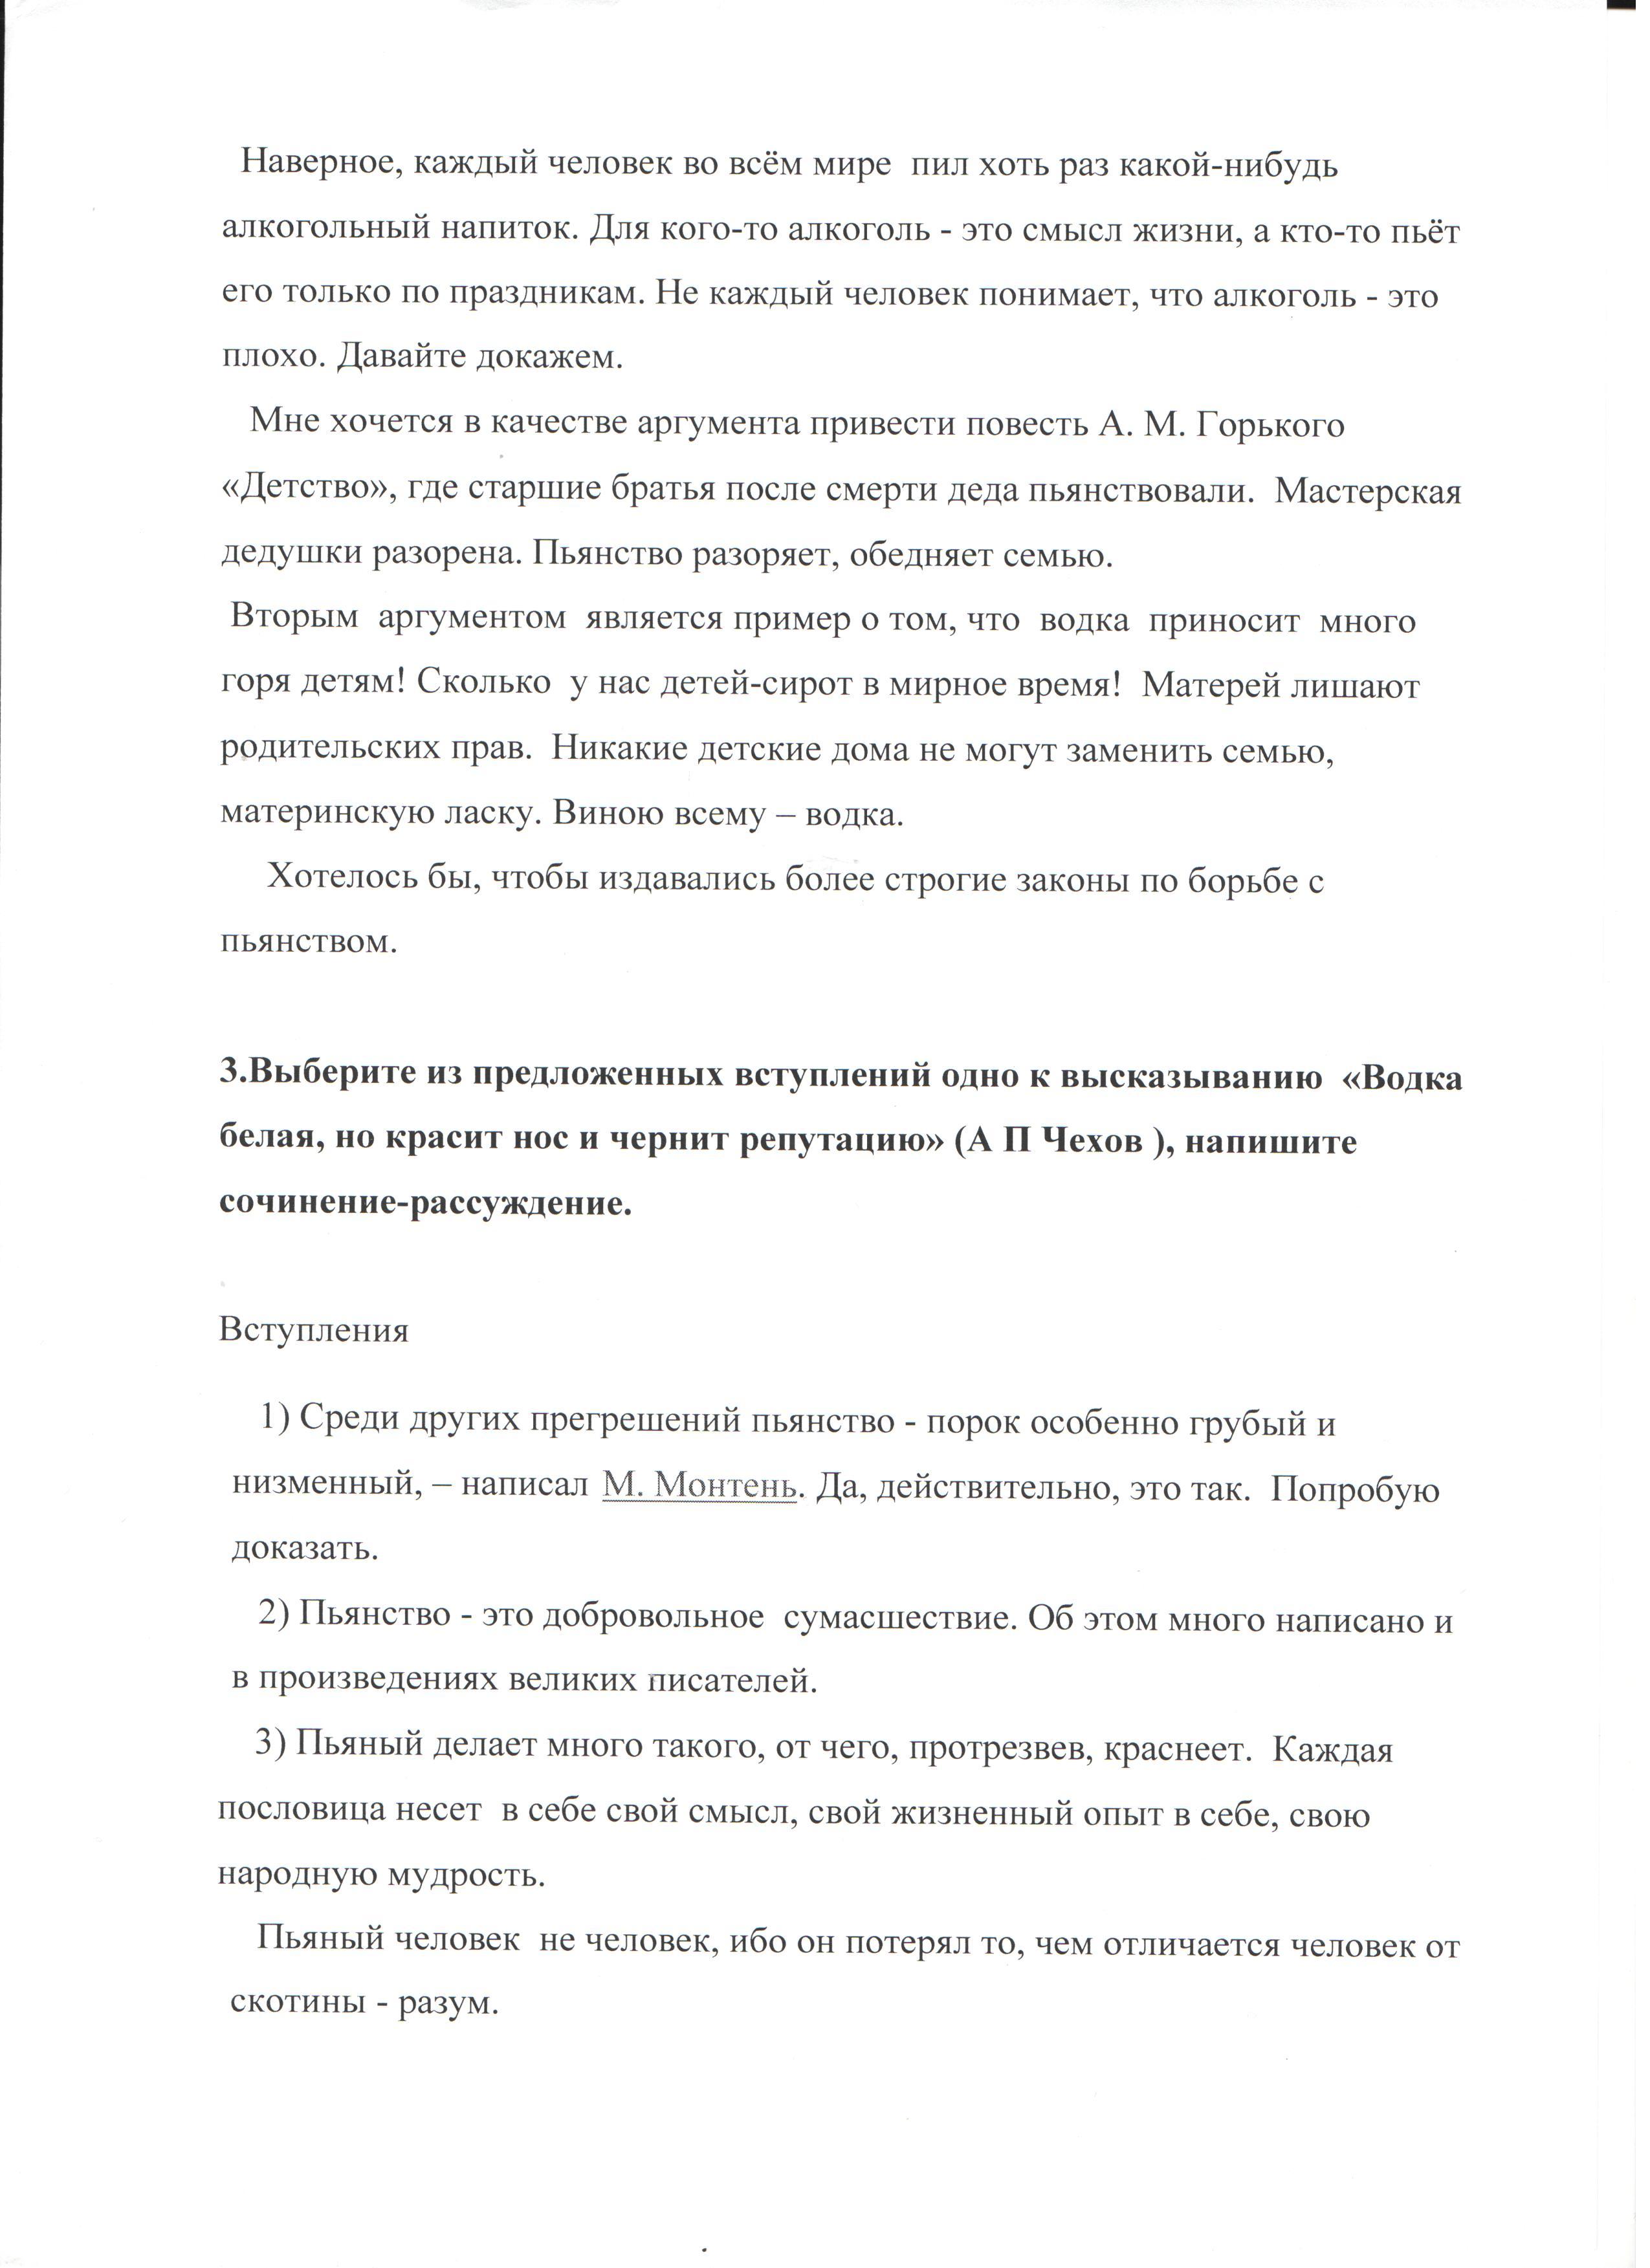 C:\Documents and Settings\Admin\Мои документы\Мои рисунки\Изображение 016.jpg